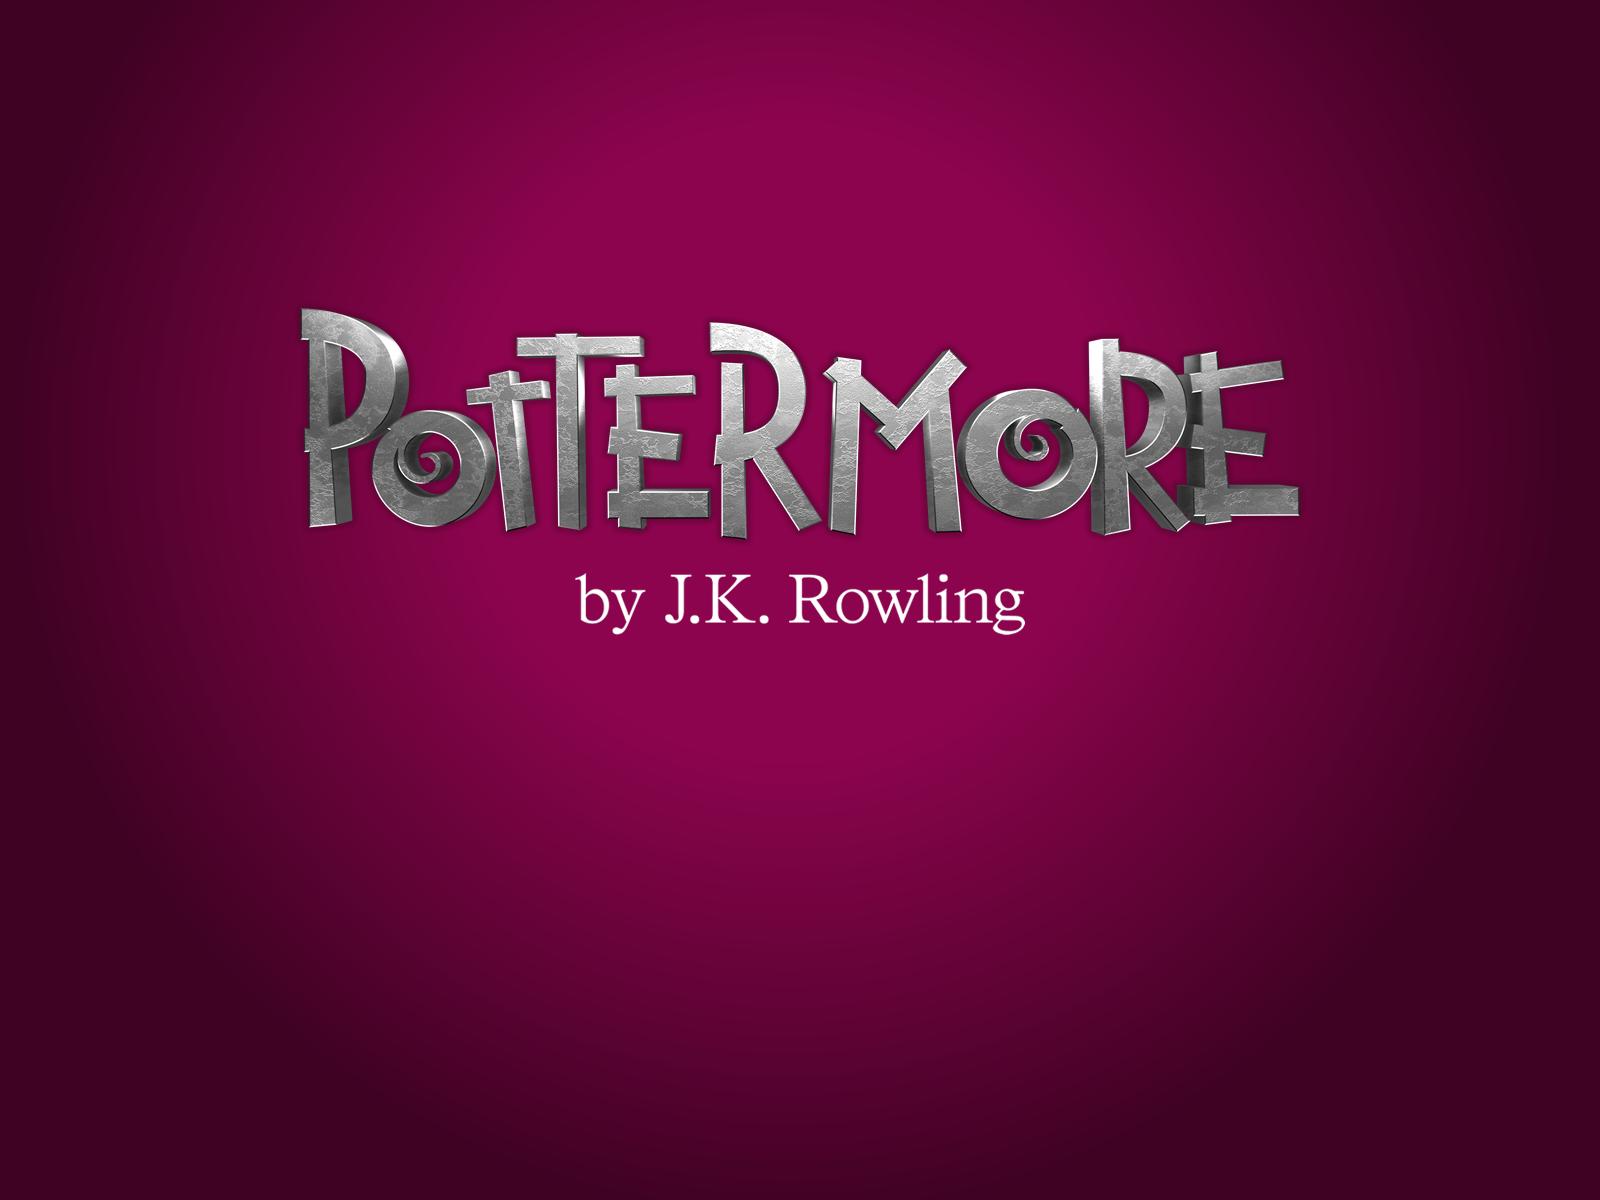 Harry Potter Pottermore on New Harry Potter Books